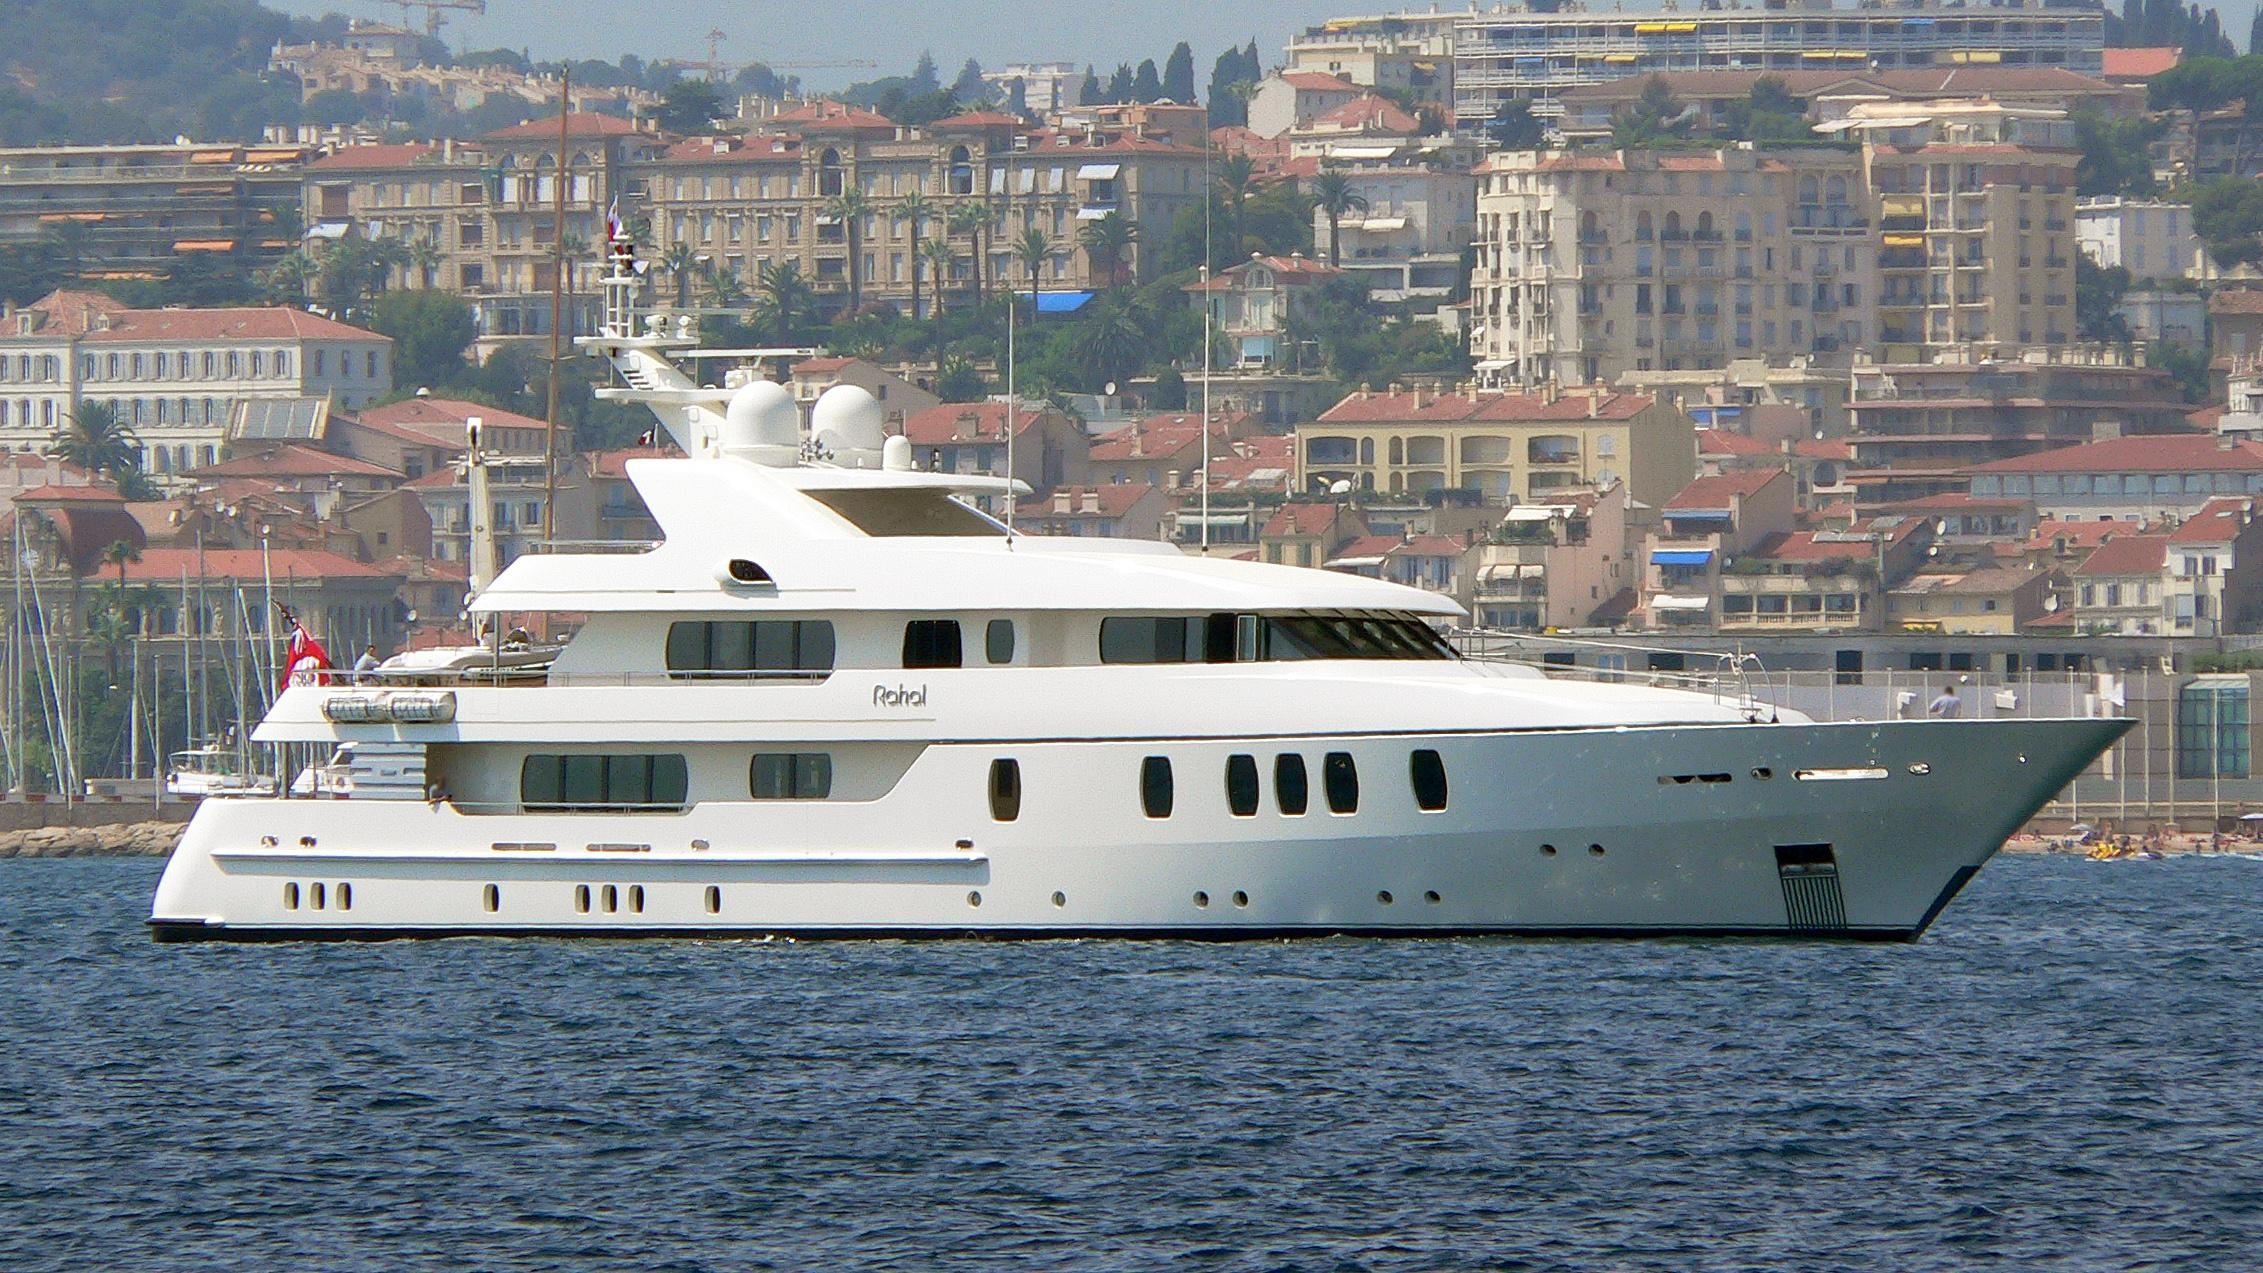 rahal-motor-yacht-feadship-2003-47m-profile